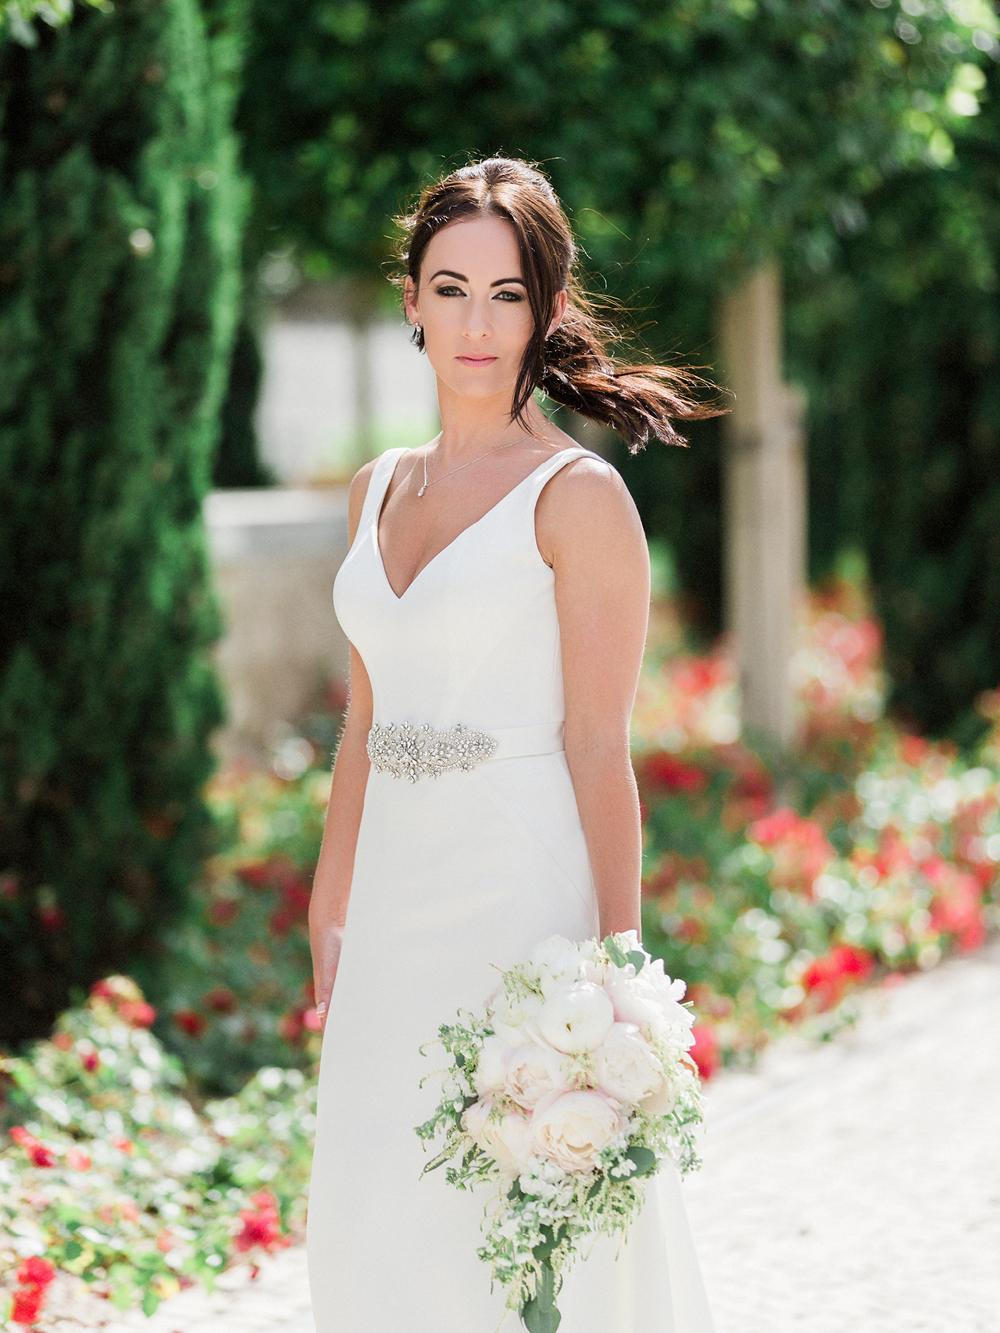 algarve_wedding_photography_Orla_Graeme_35.jpg